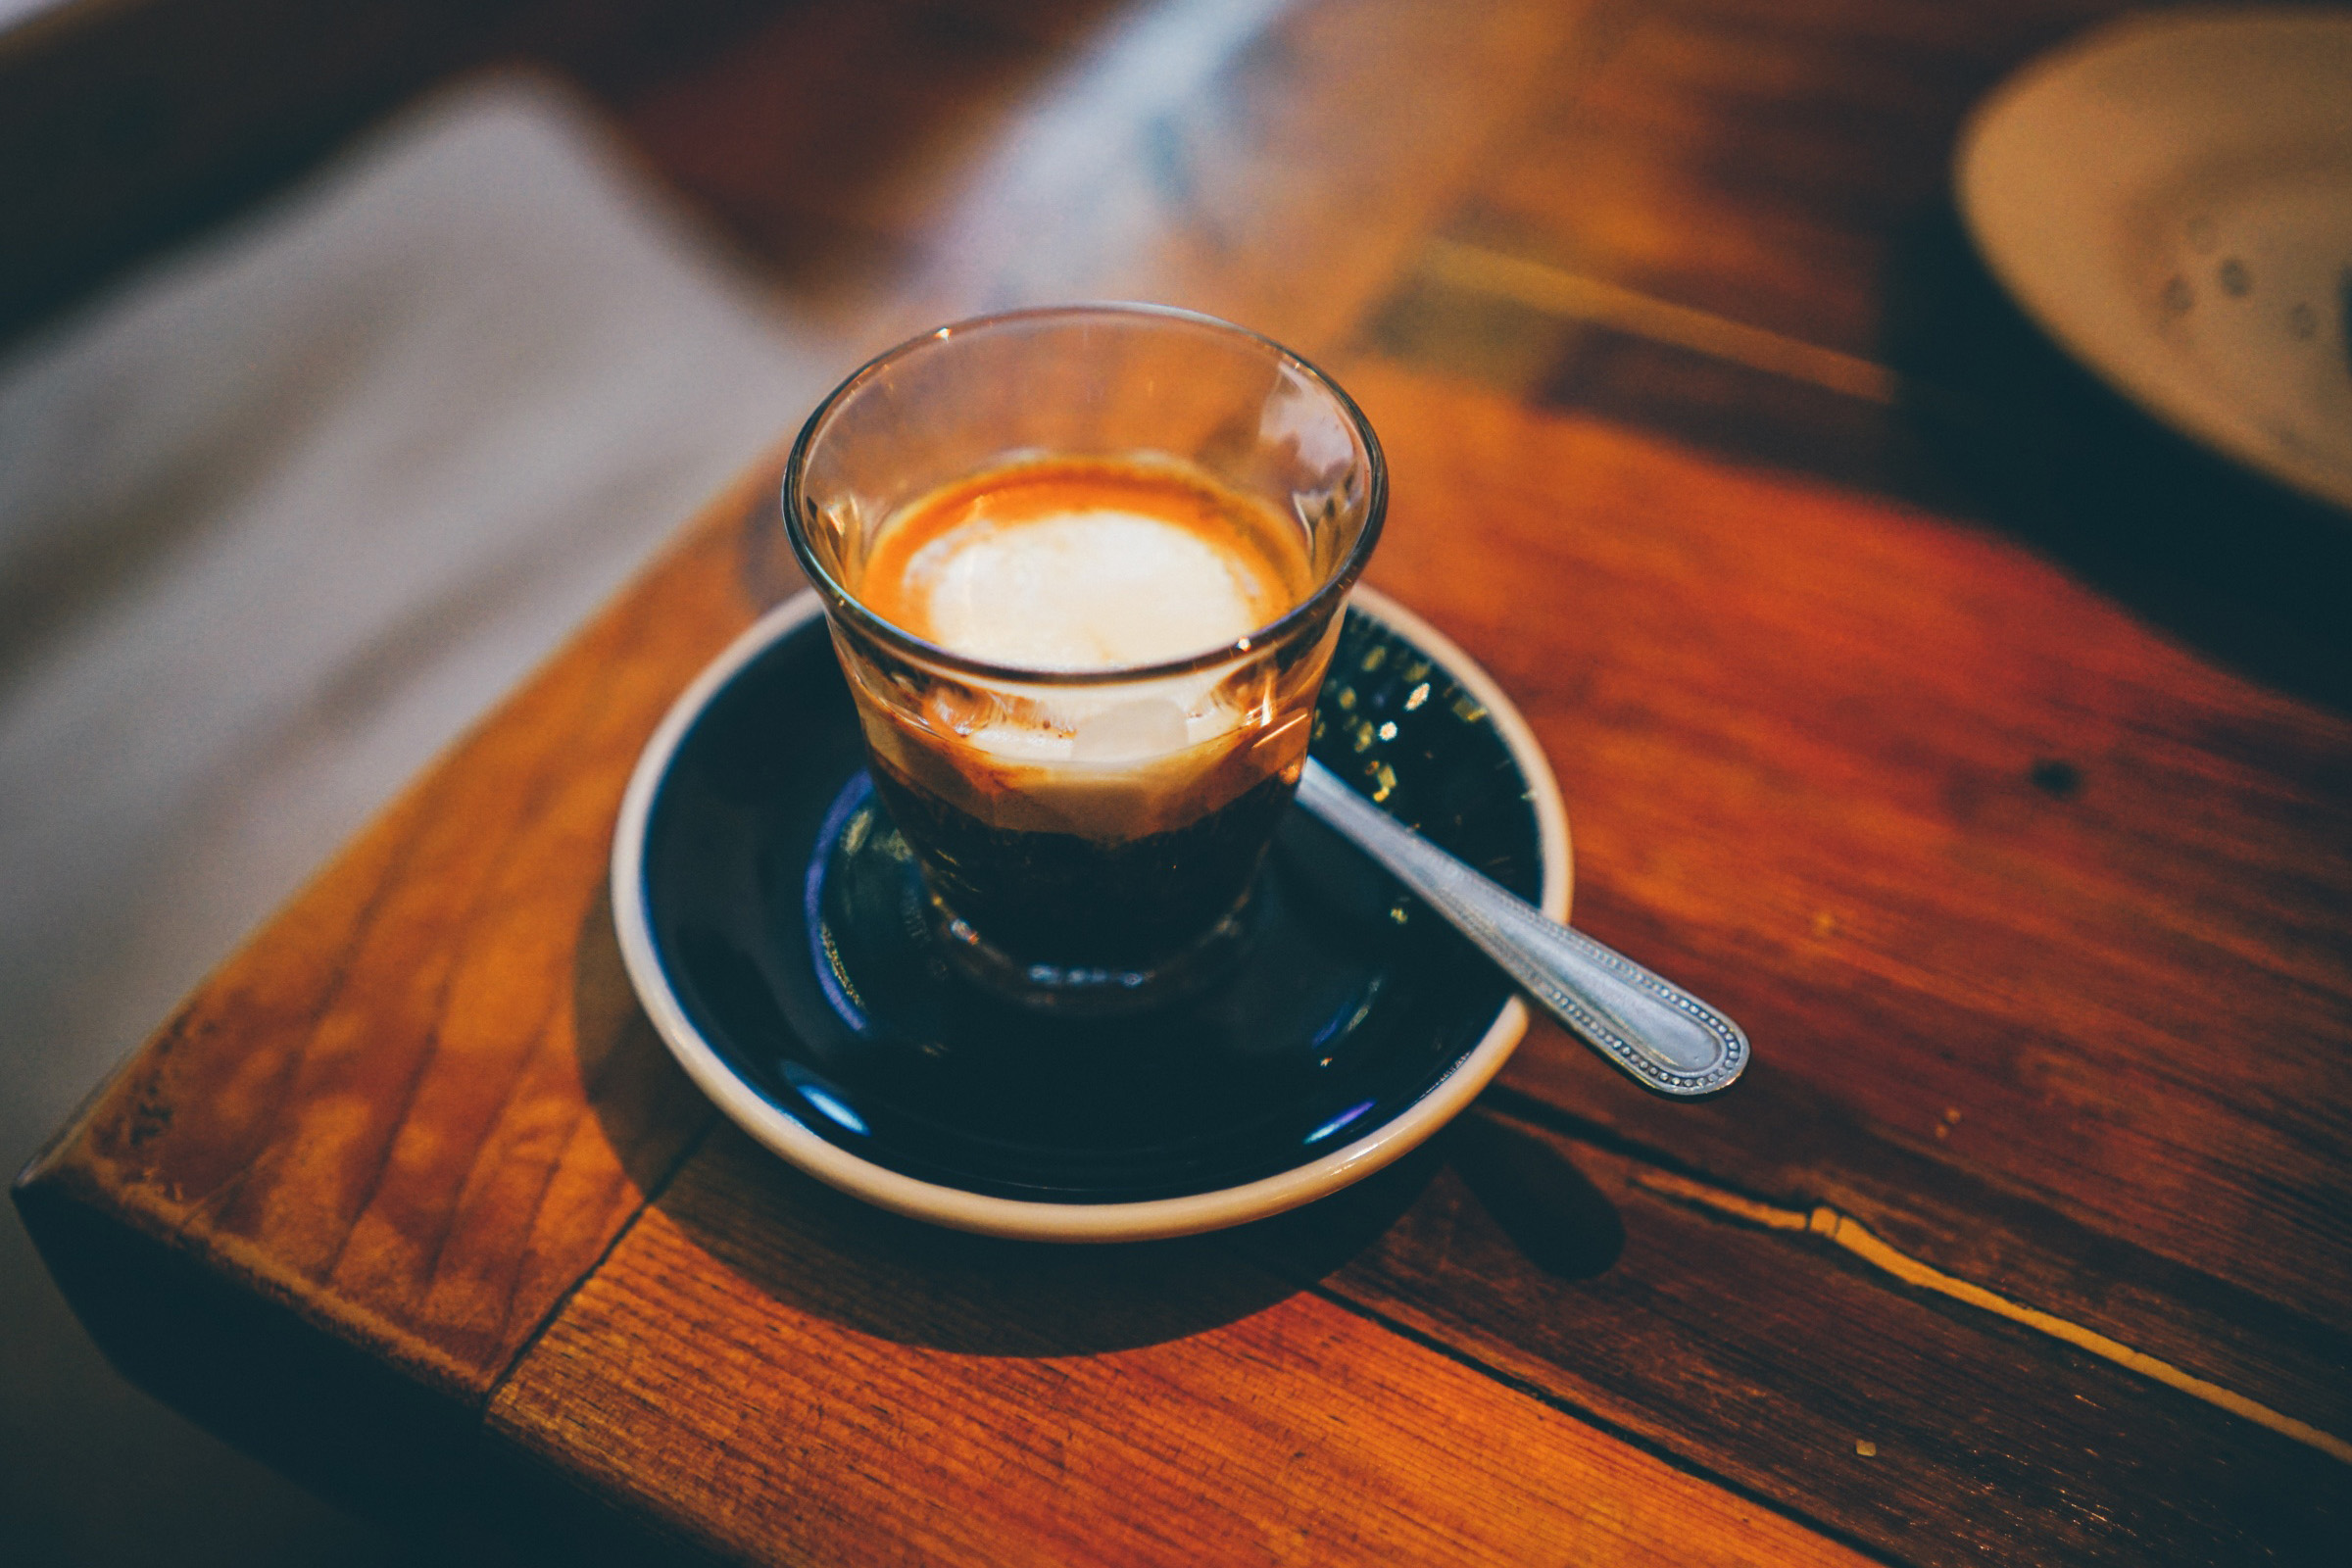 Coffee + Friends = Sanity